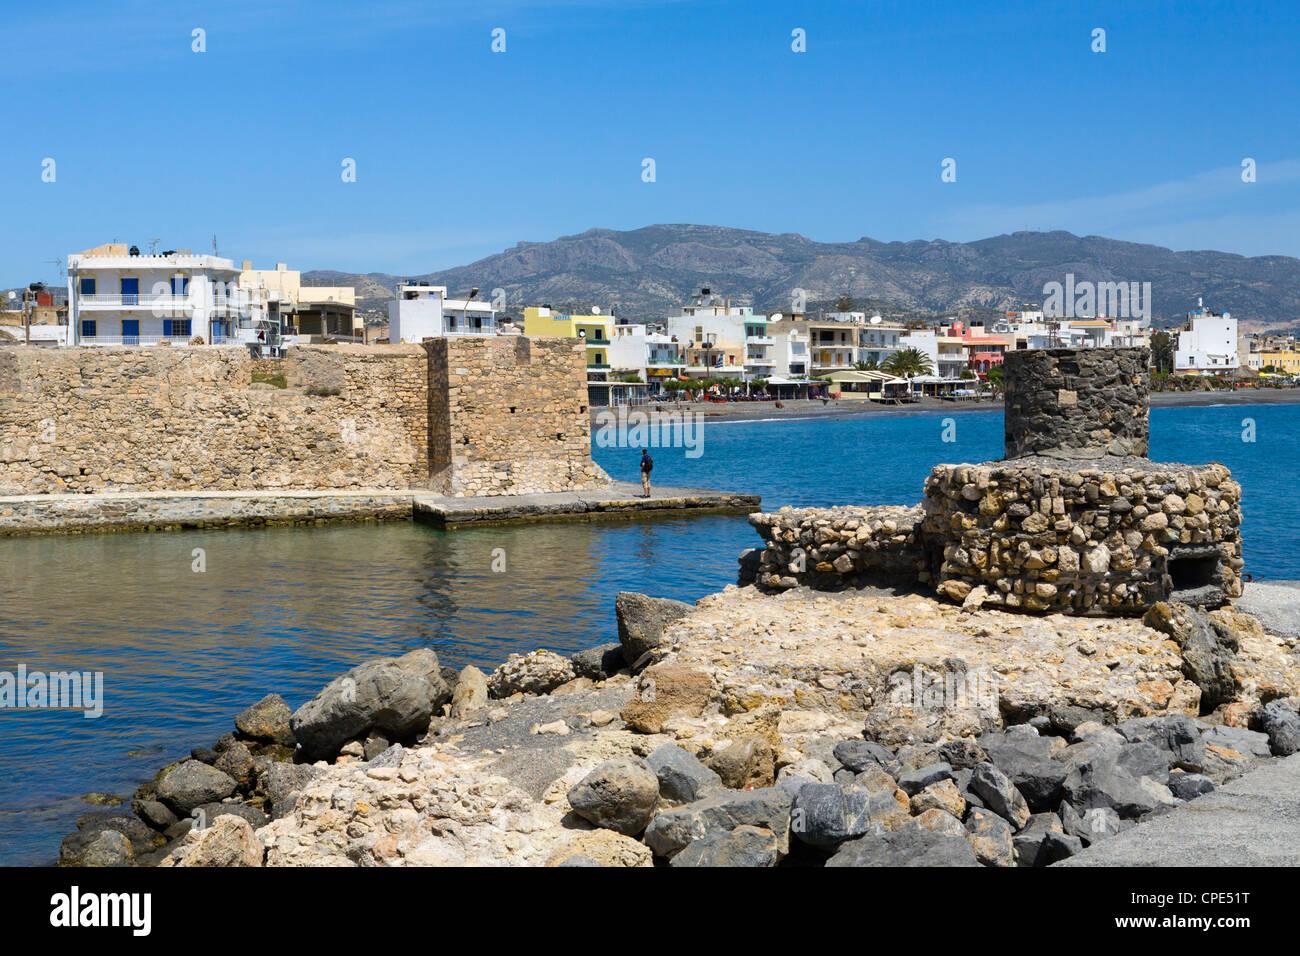 Sea front and Venetian fortress, Ierapetra, Lasithi region, Crete, Greek Islands, Greece, Europe - Stock Image